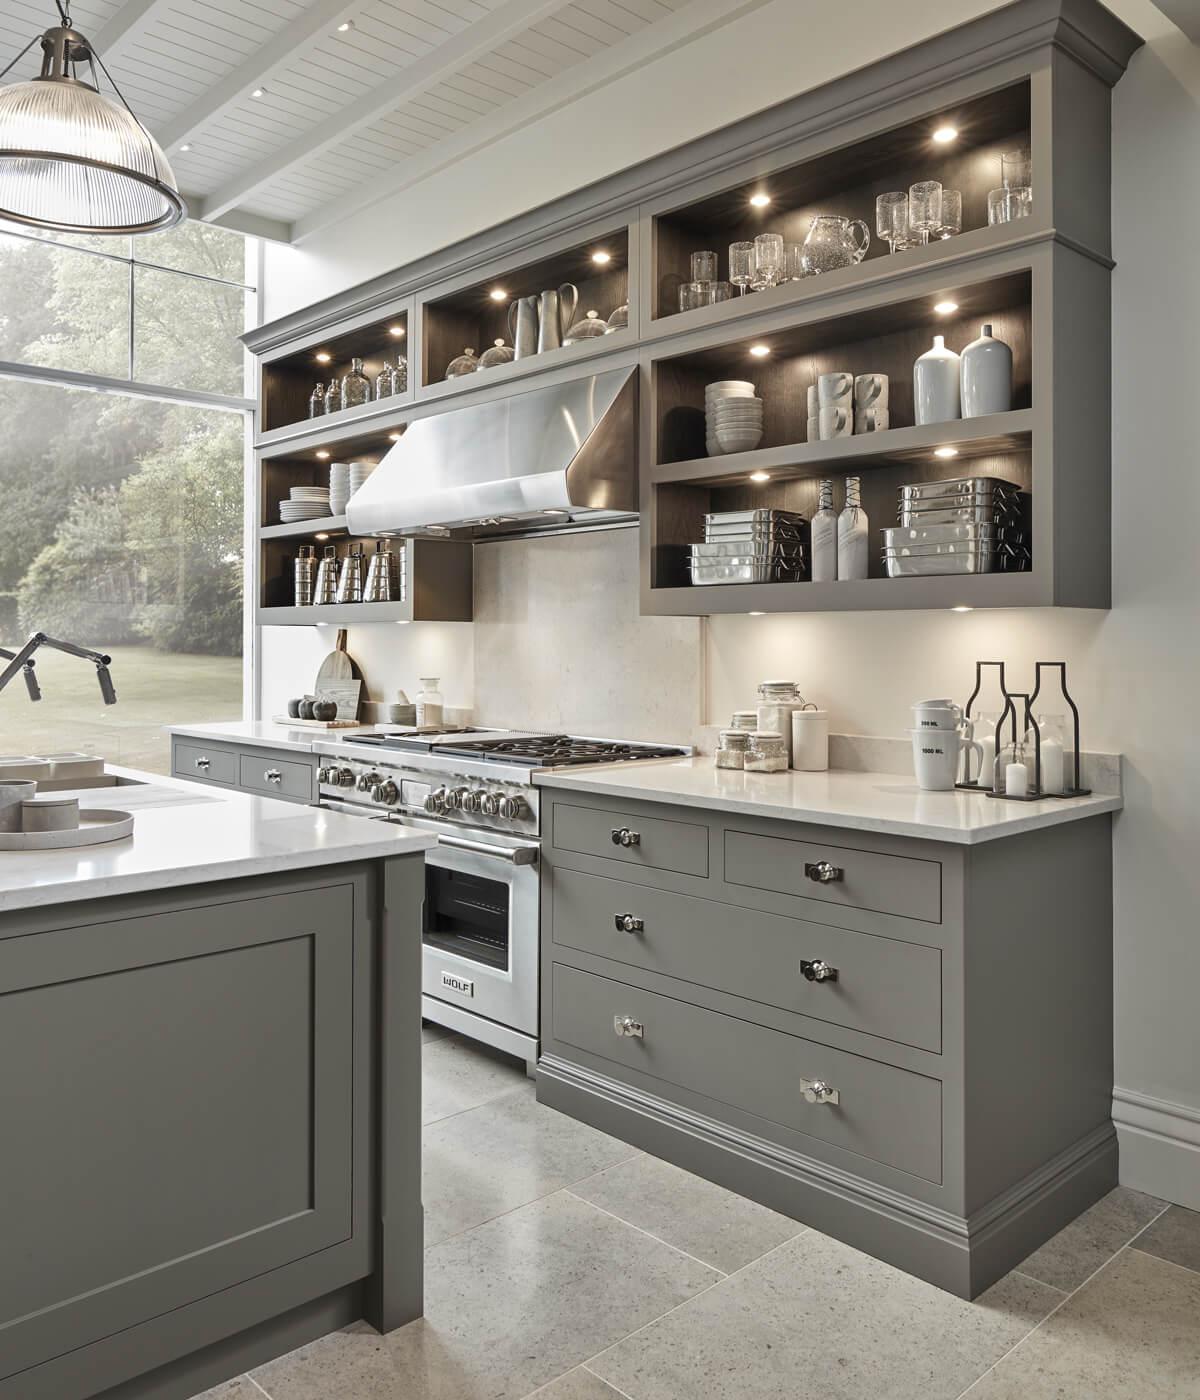 Kitchen Design Alternatives for Upper Cabinets   Centsational Style